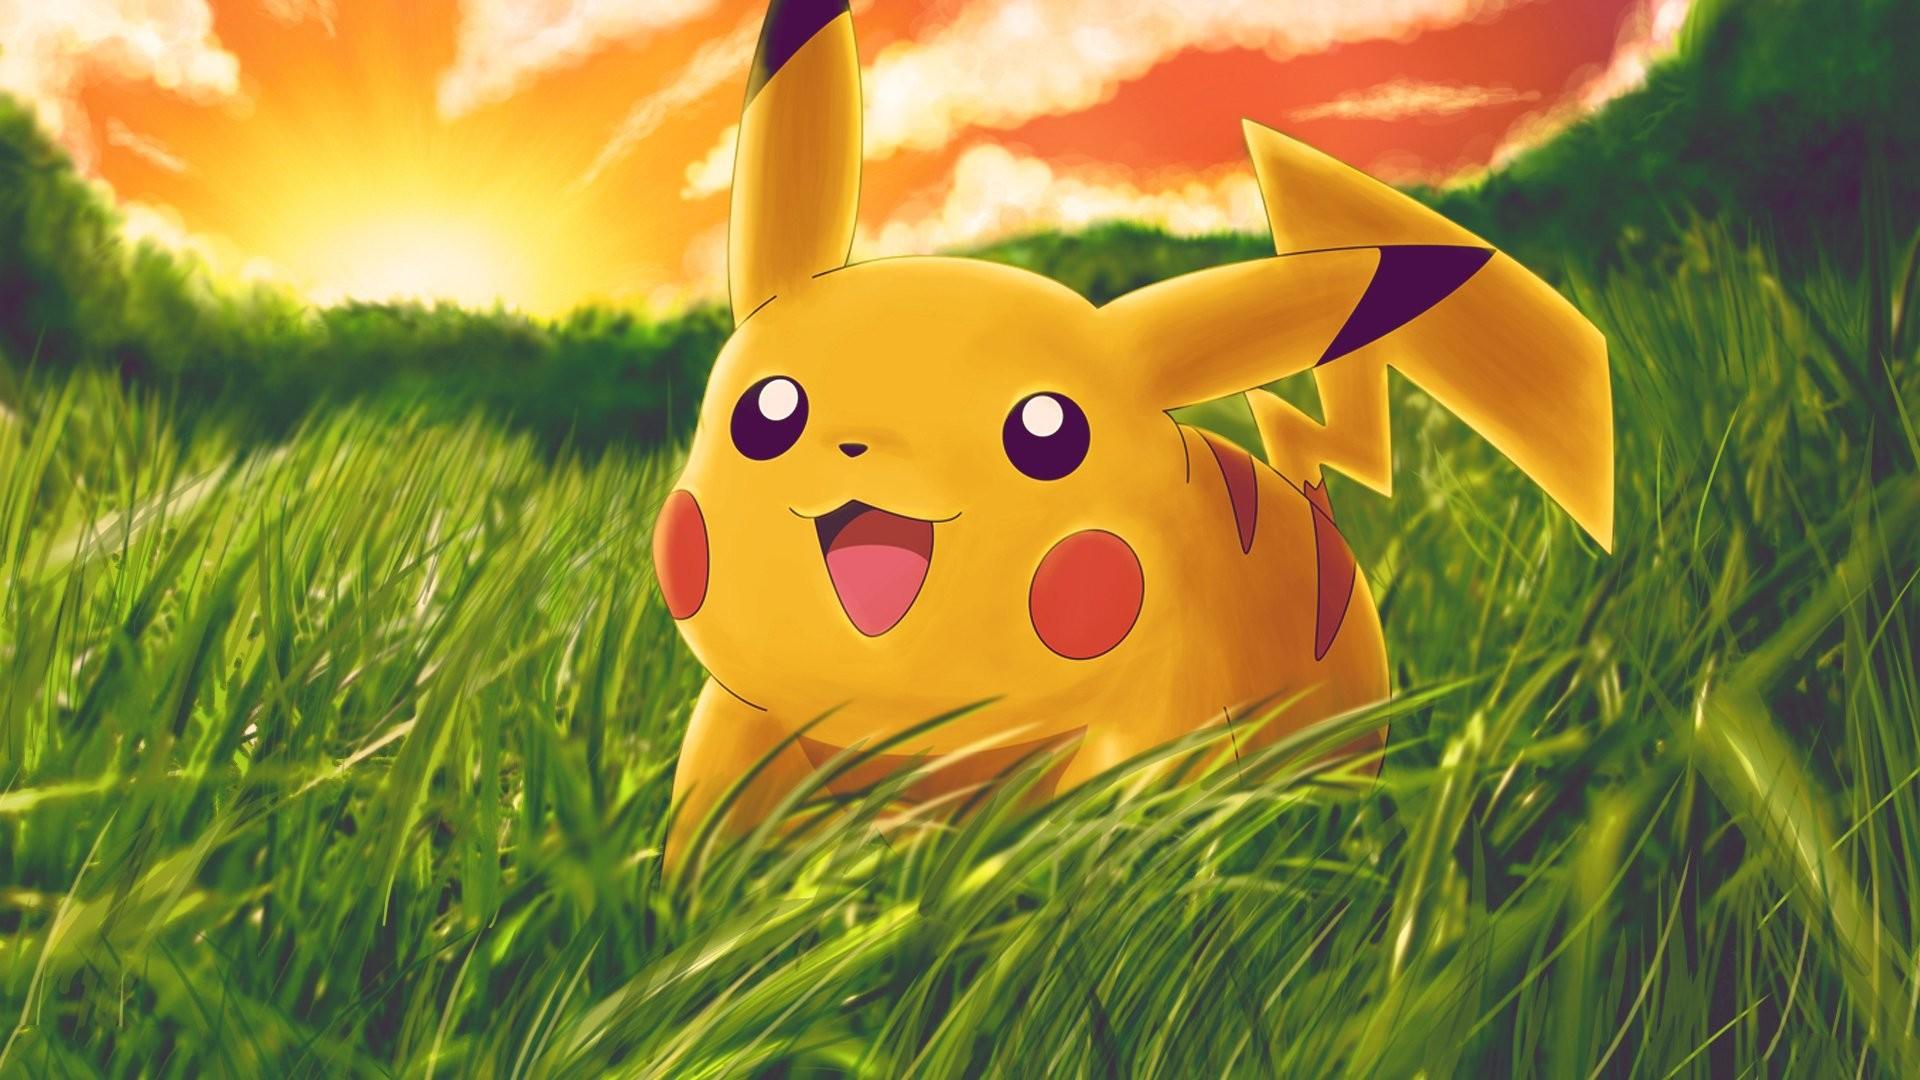 Pikachu Wallpaper 1920x1080 82 images 1920x1080